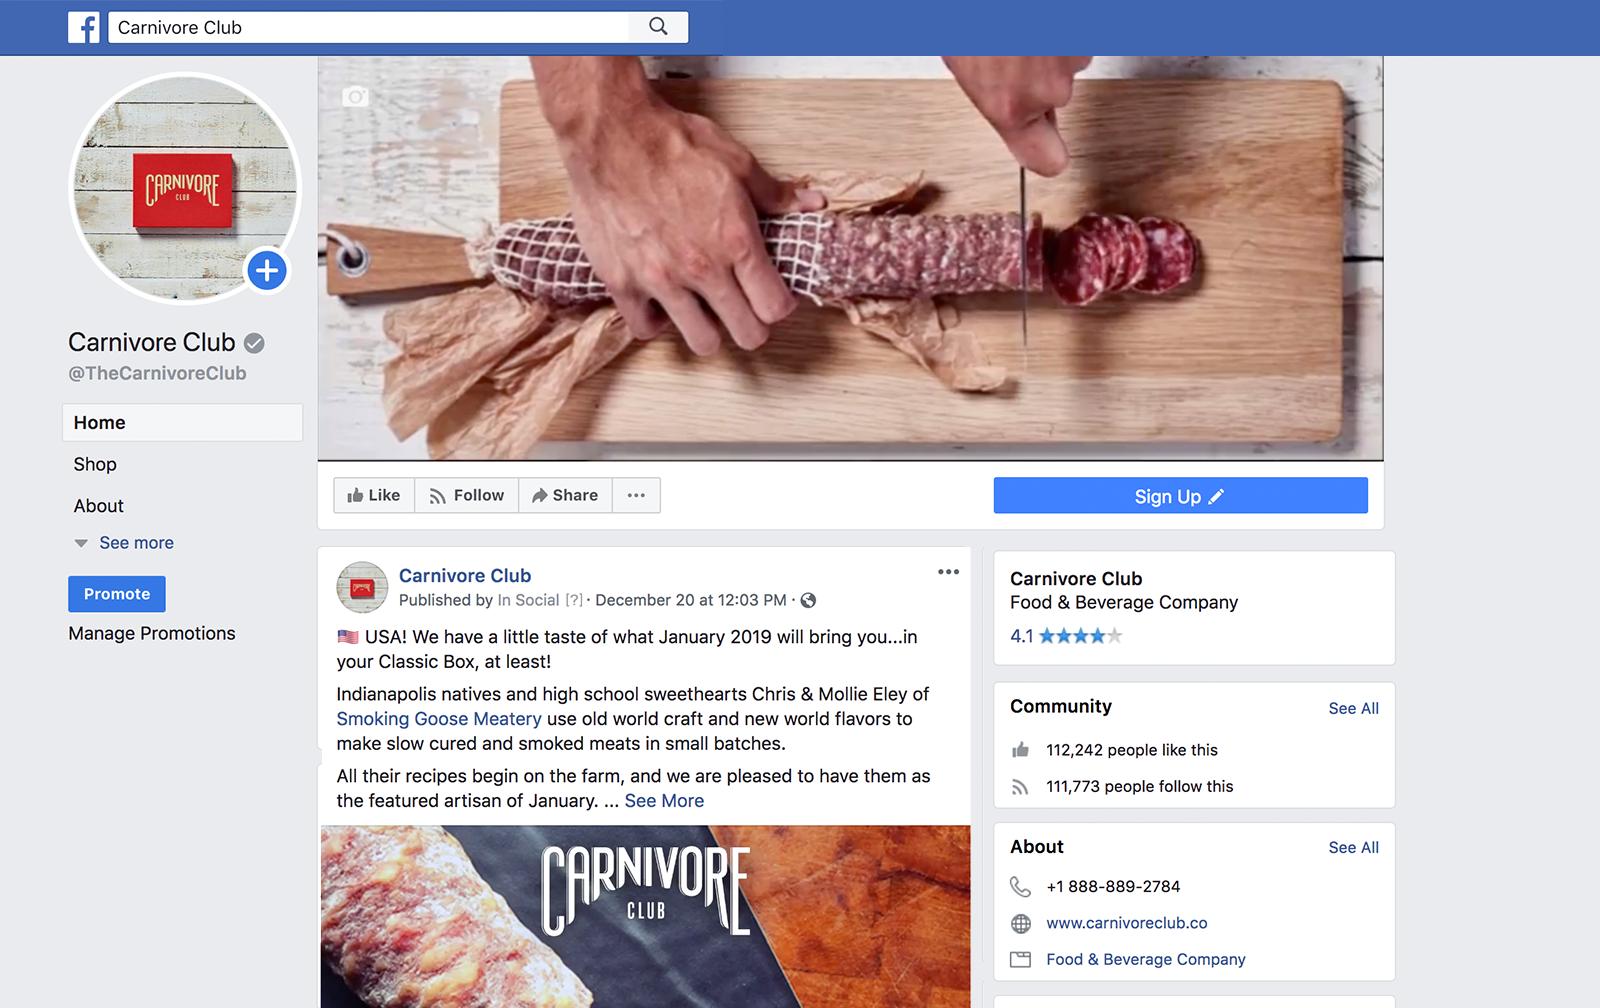 carnivore club Facebook